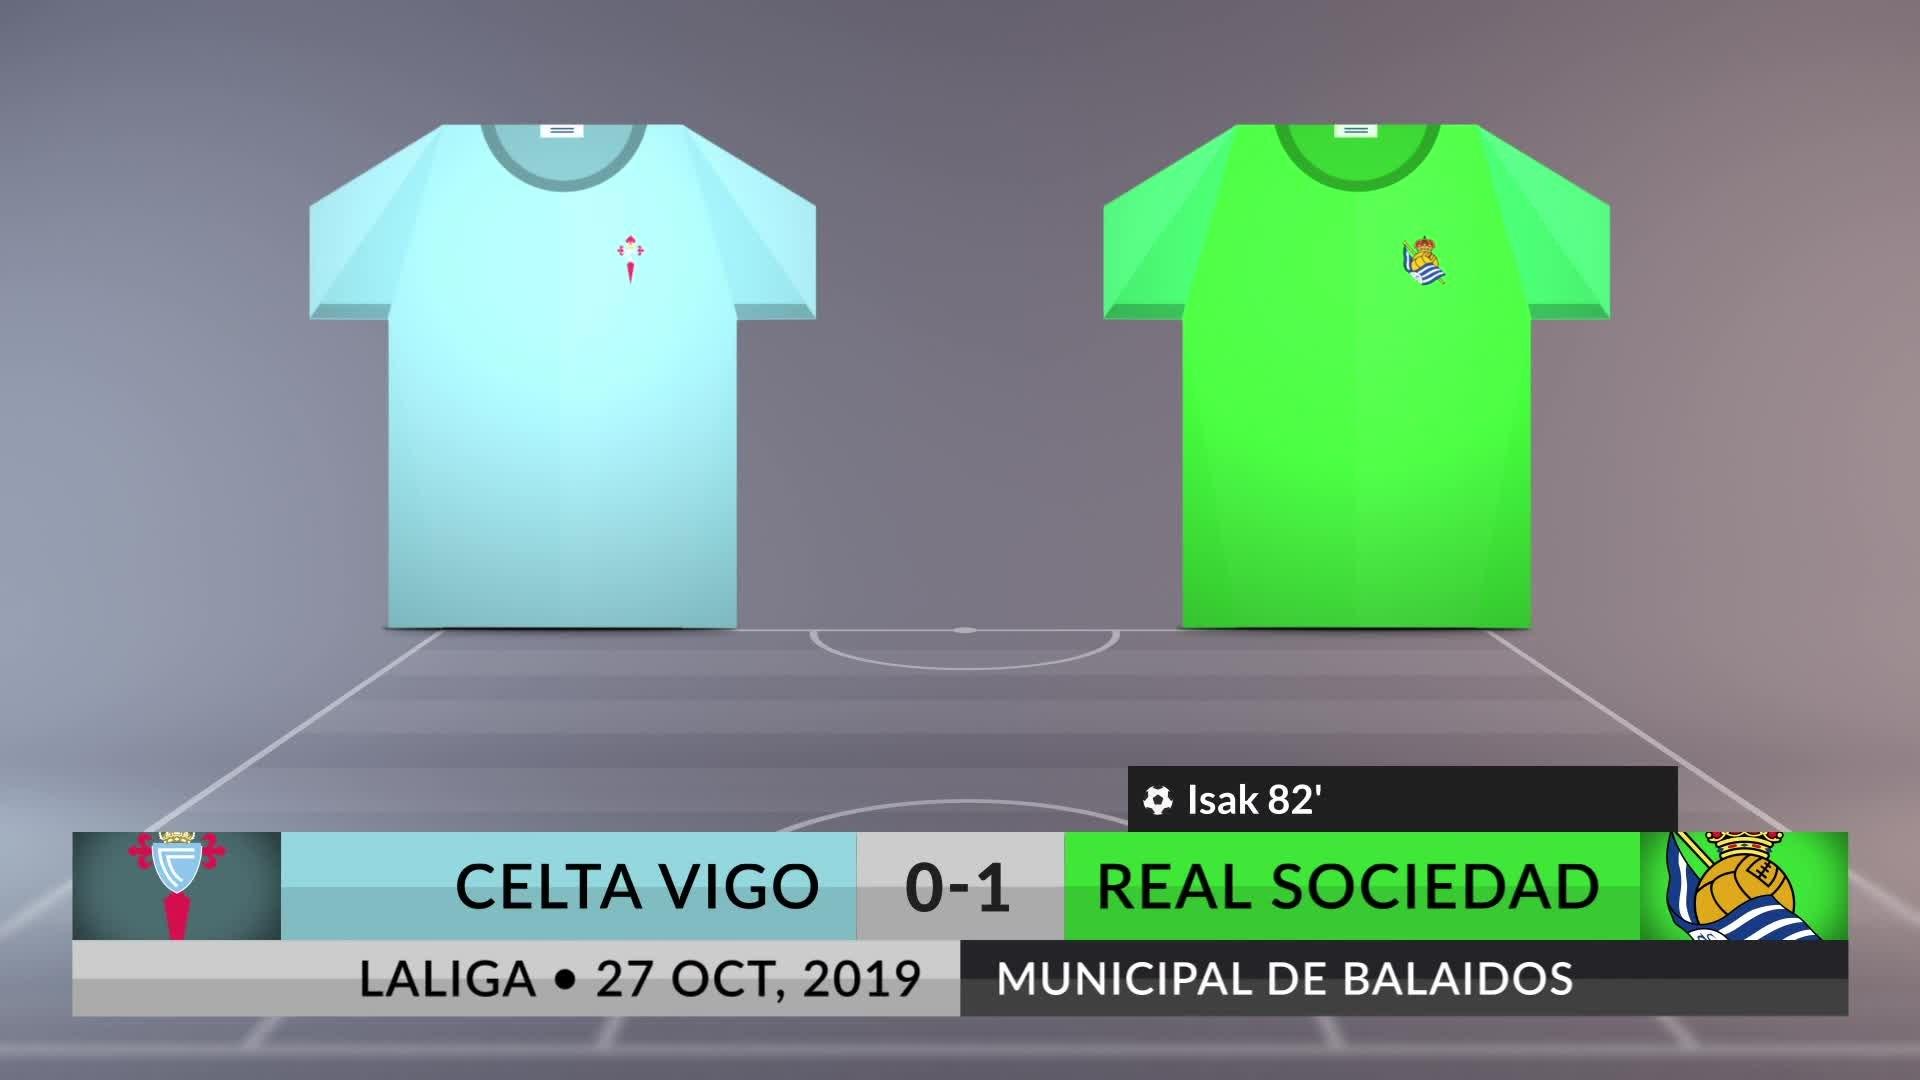 Match Review: Celta Vigo vs Real Sociedad on 27/10/2019